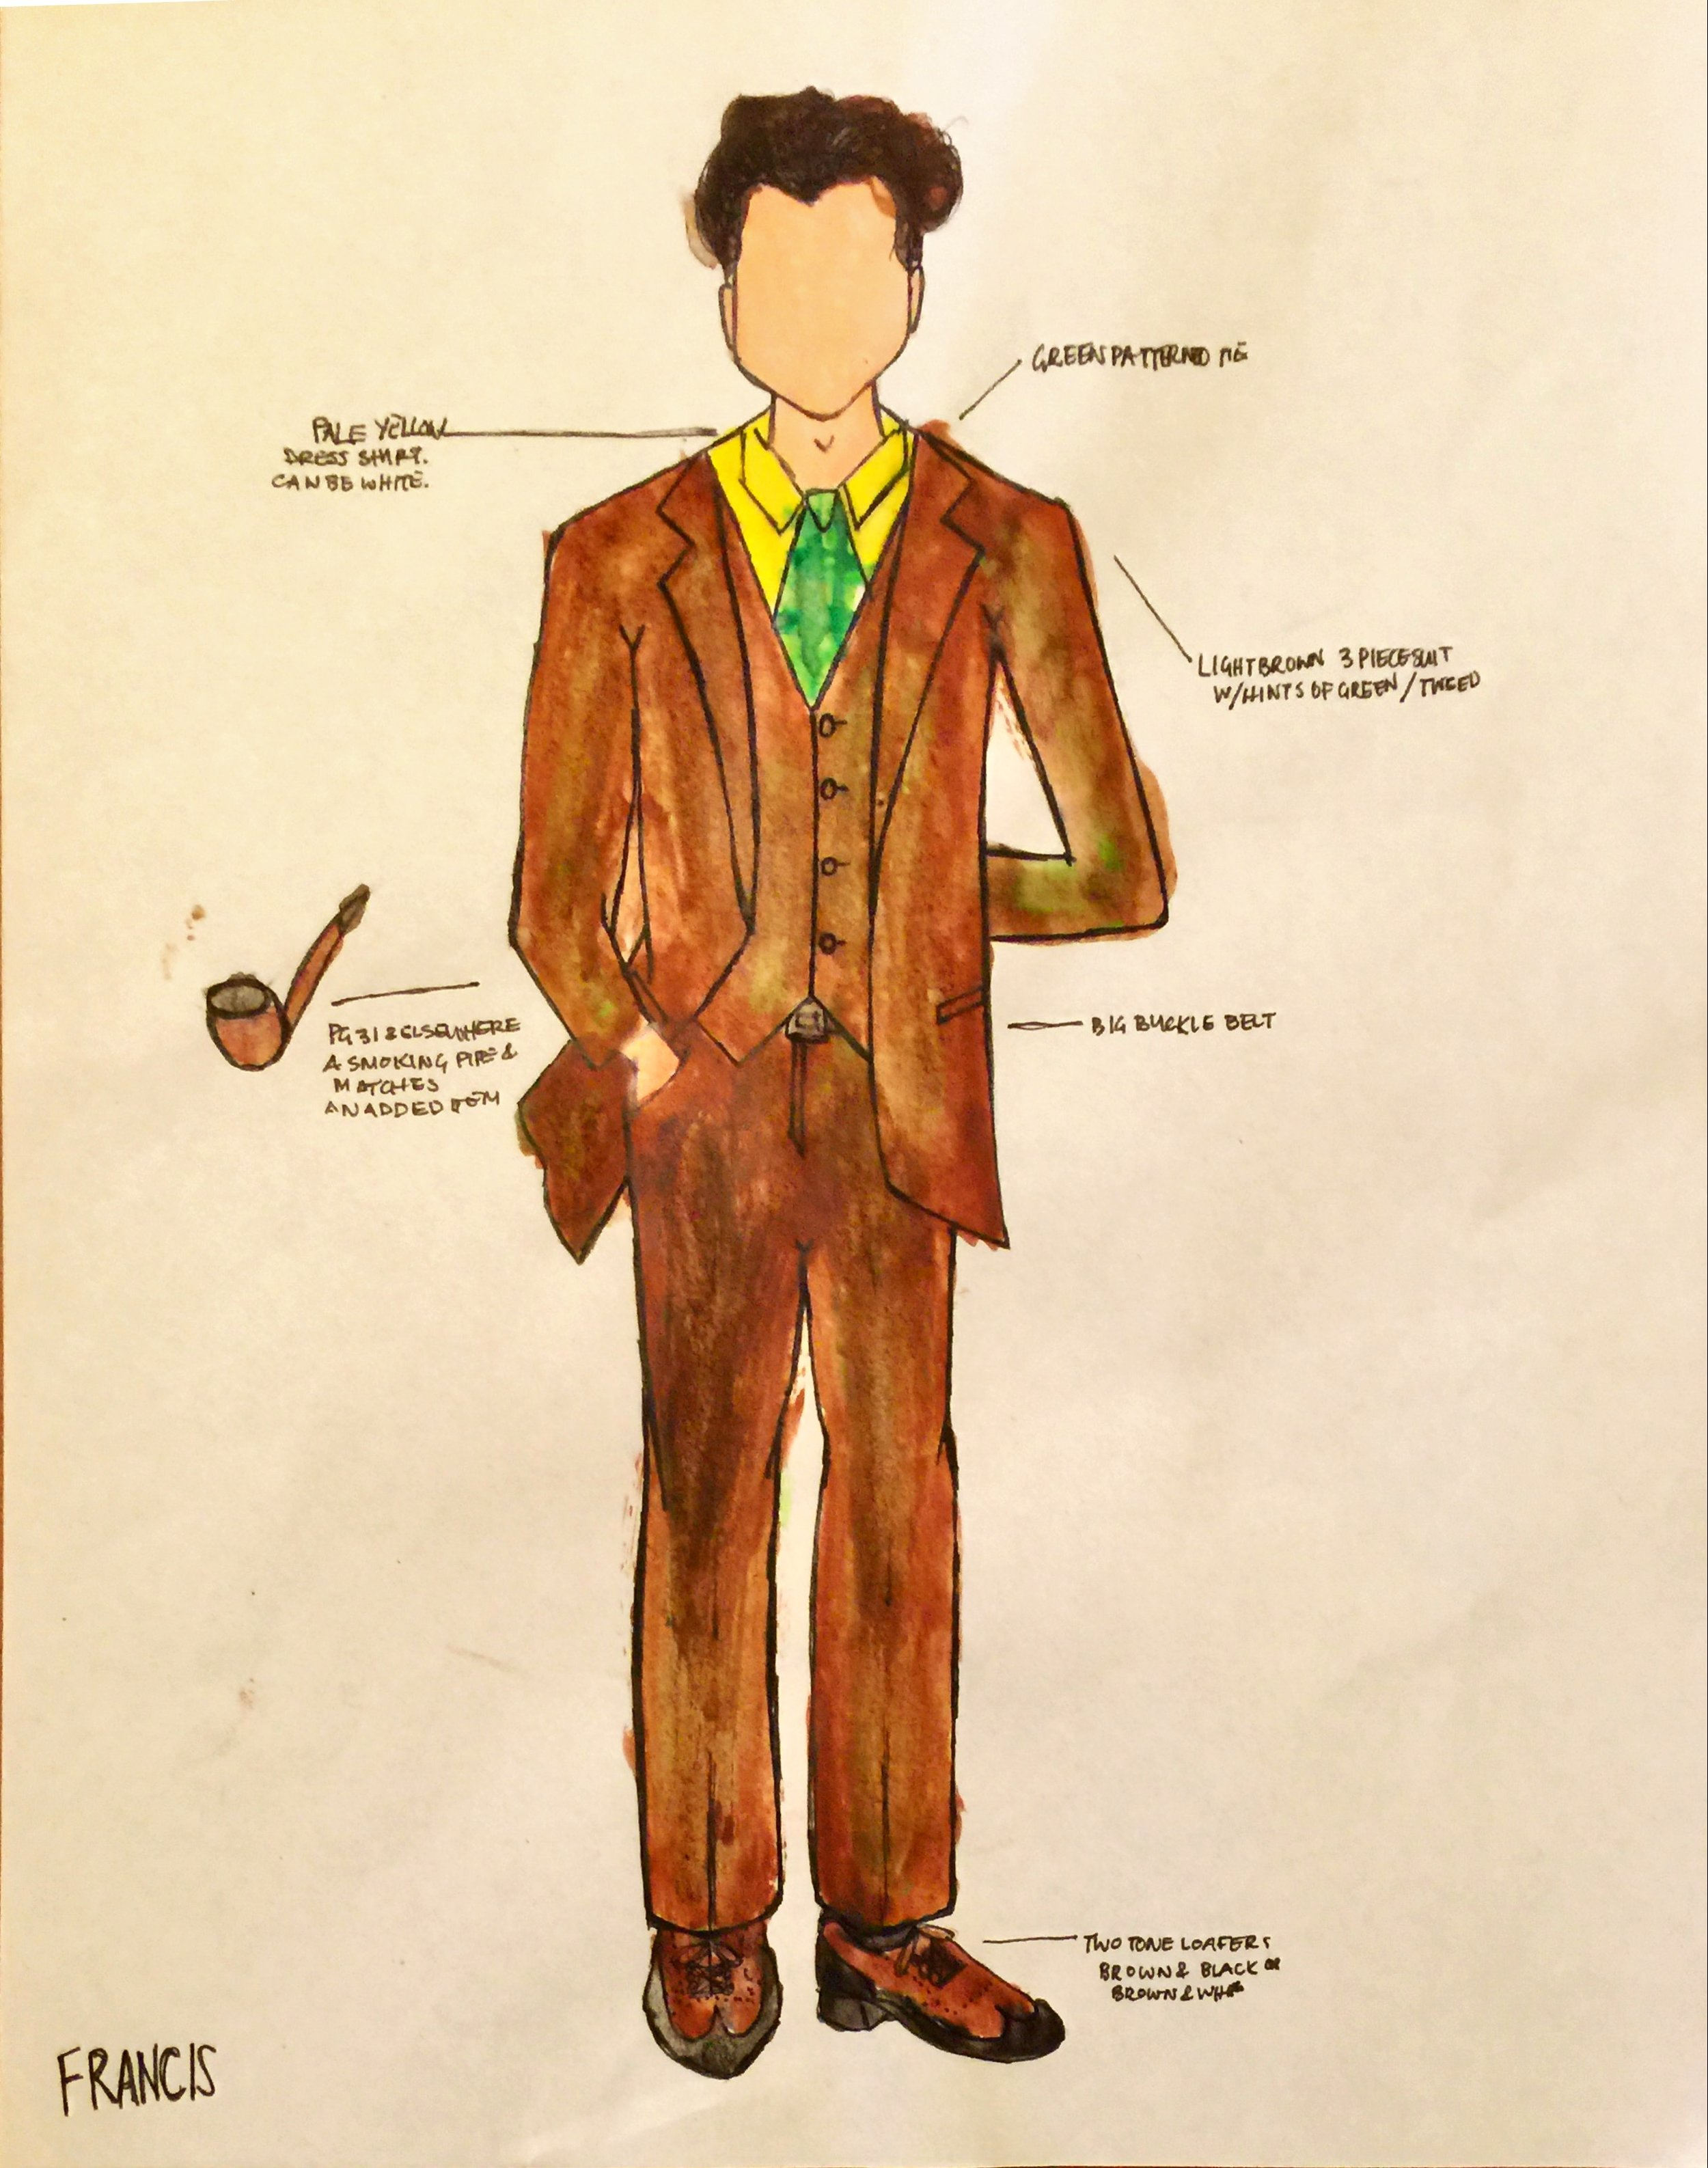 Costumes by Asha McAllister